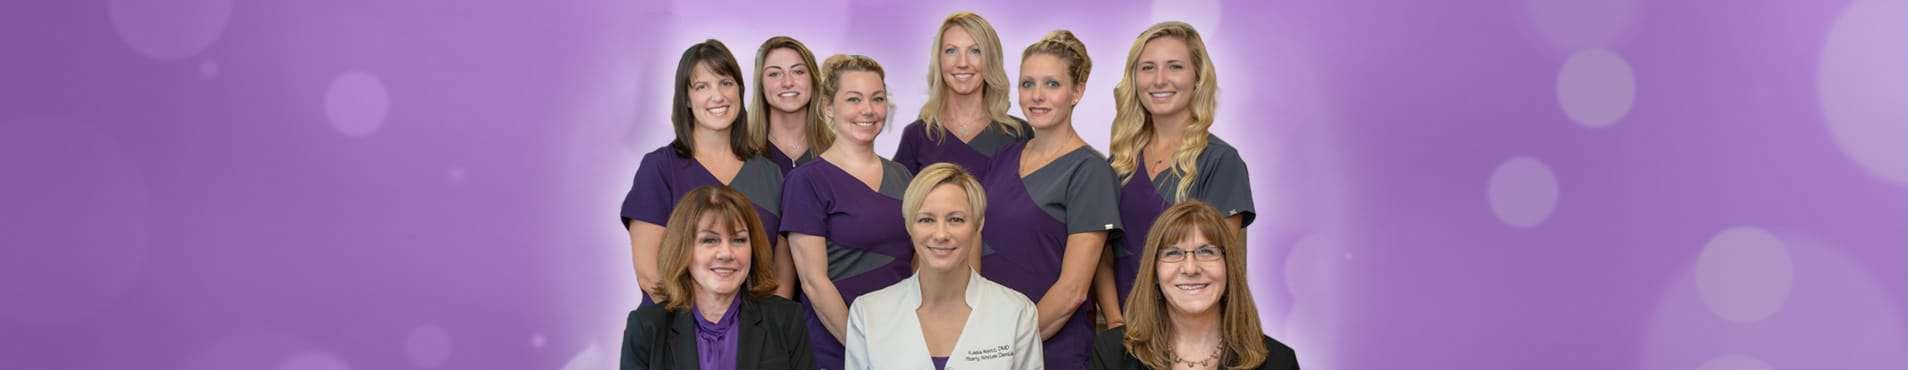 Dental Crowns Dentist Serving Fairless Hills